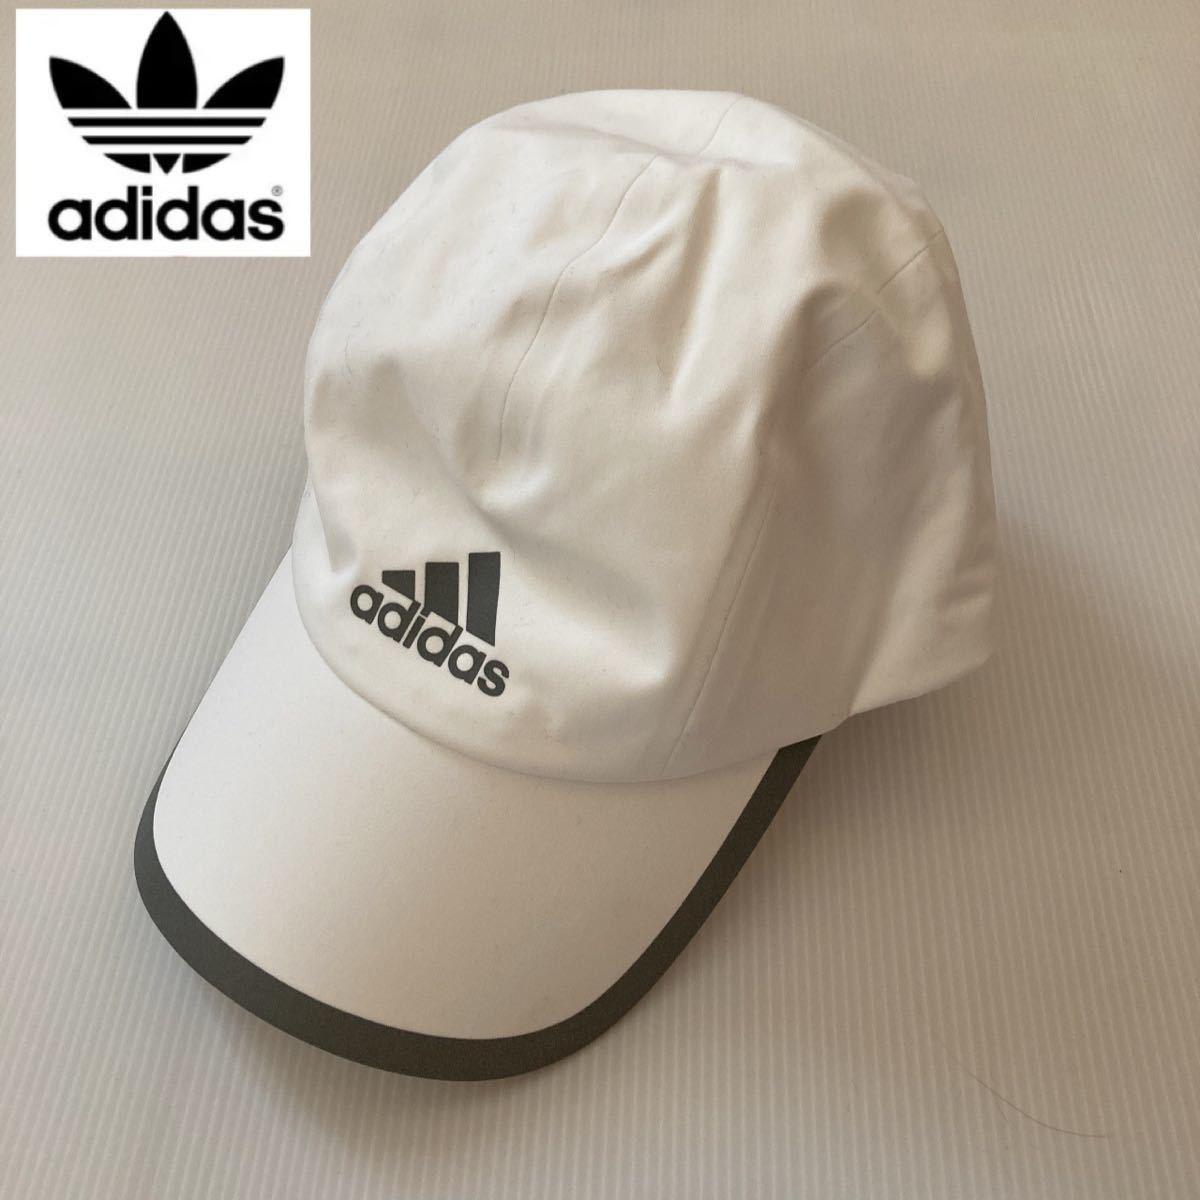 adidas ランニングキャップ ユニセックス 男女兼用フリーサイズ ホワイト